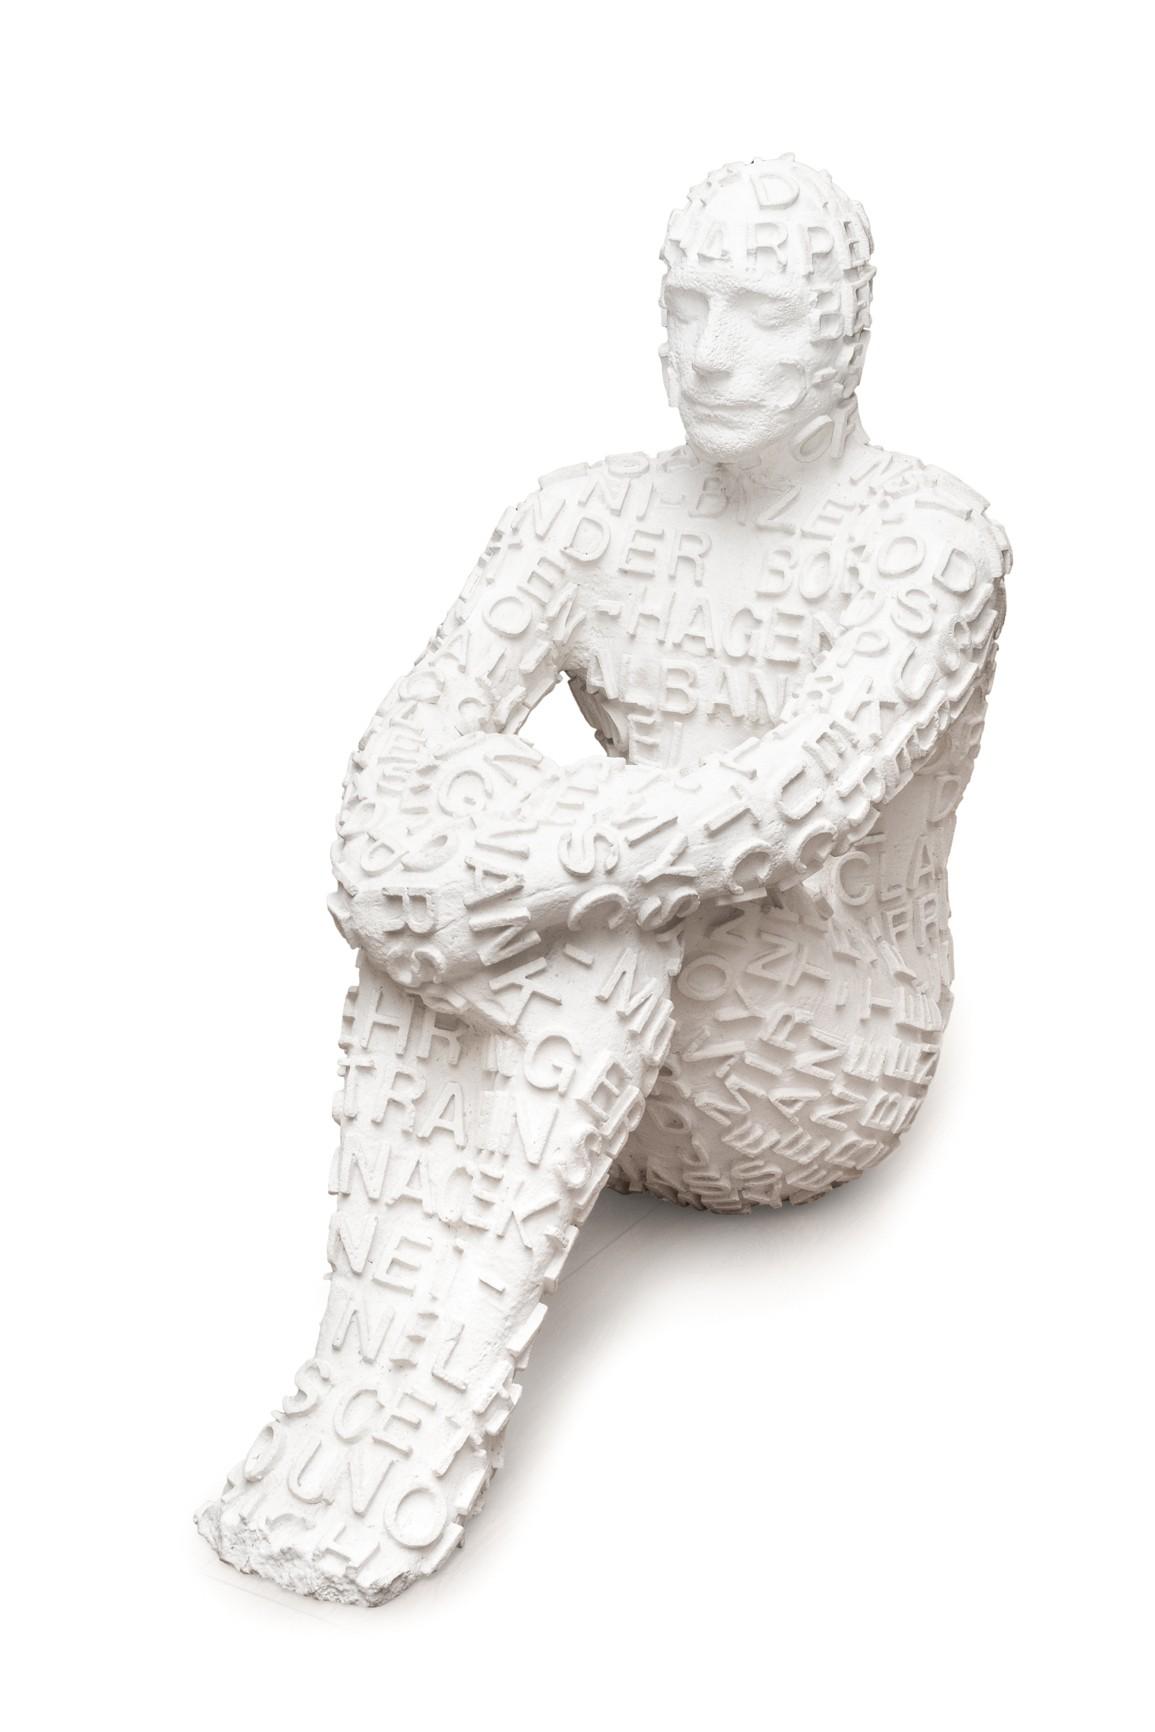 Jaume Plensa. Autorretrato como HB II, 2006. Salida: 80.000 euros. Remate: 120.000 euros